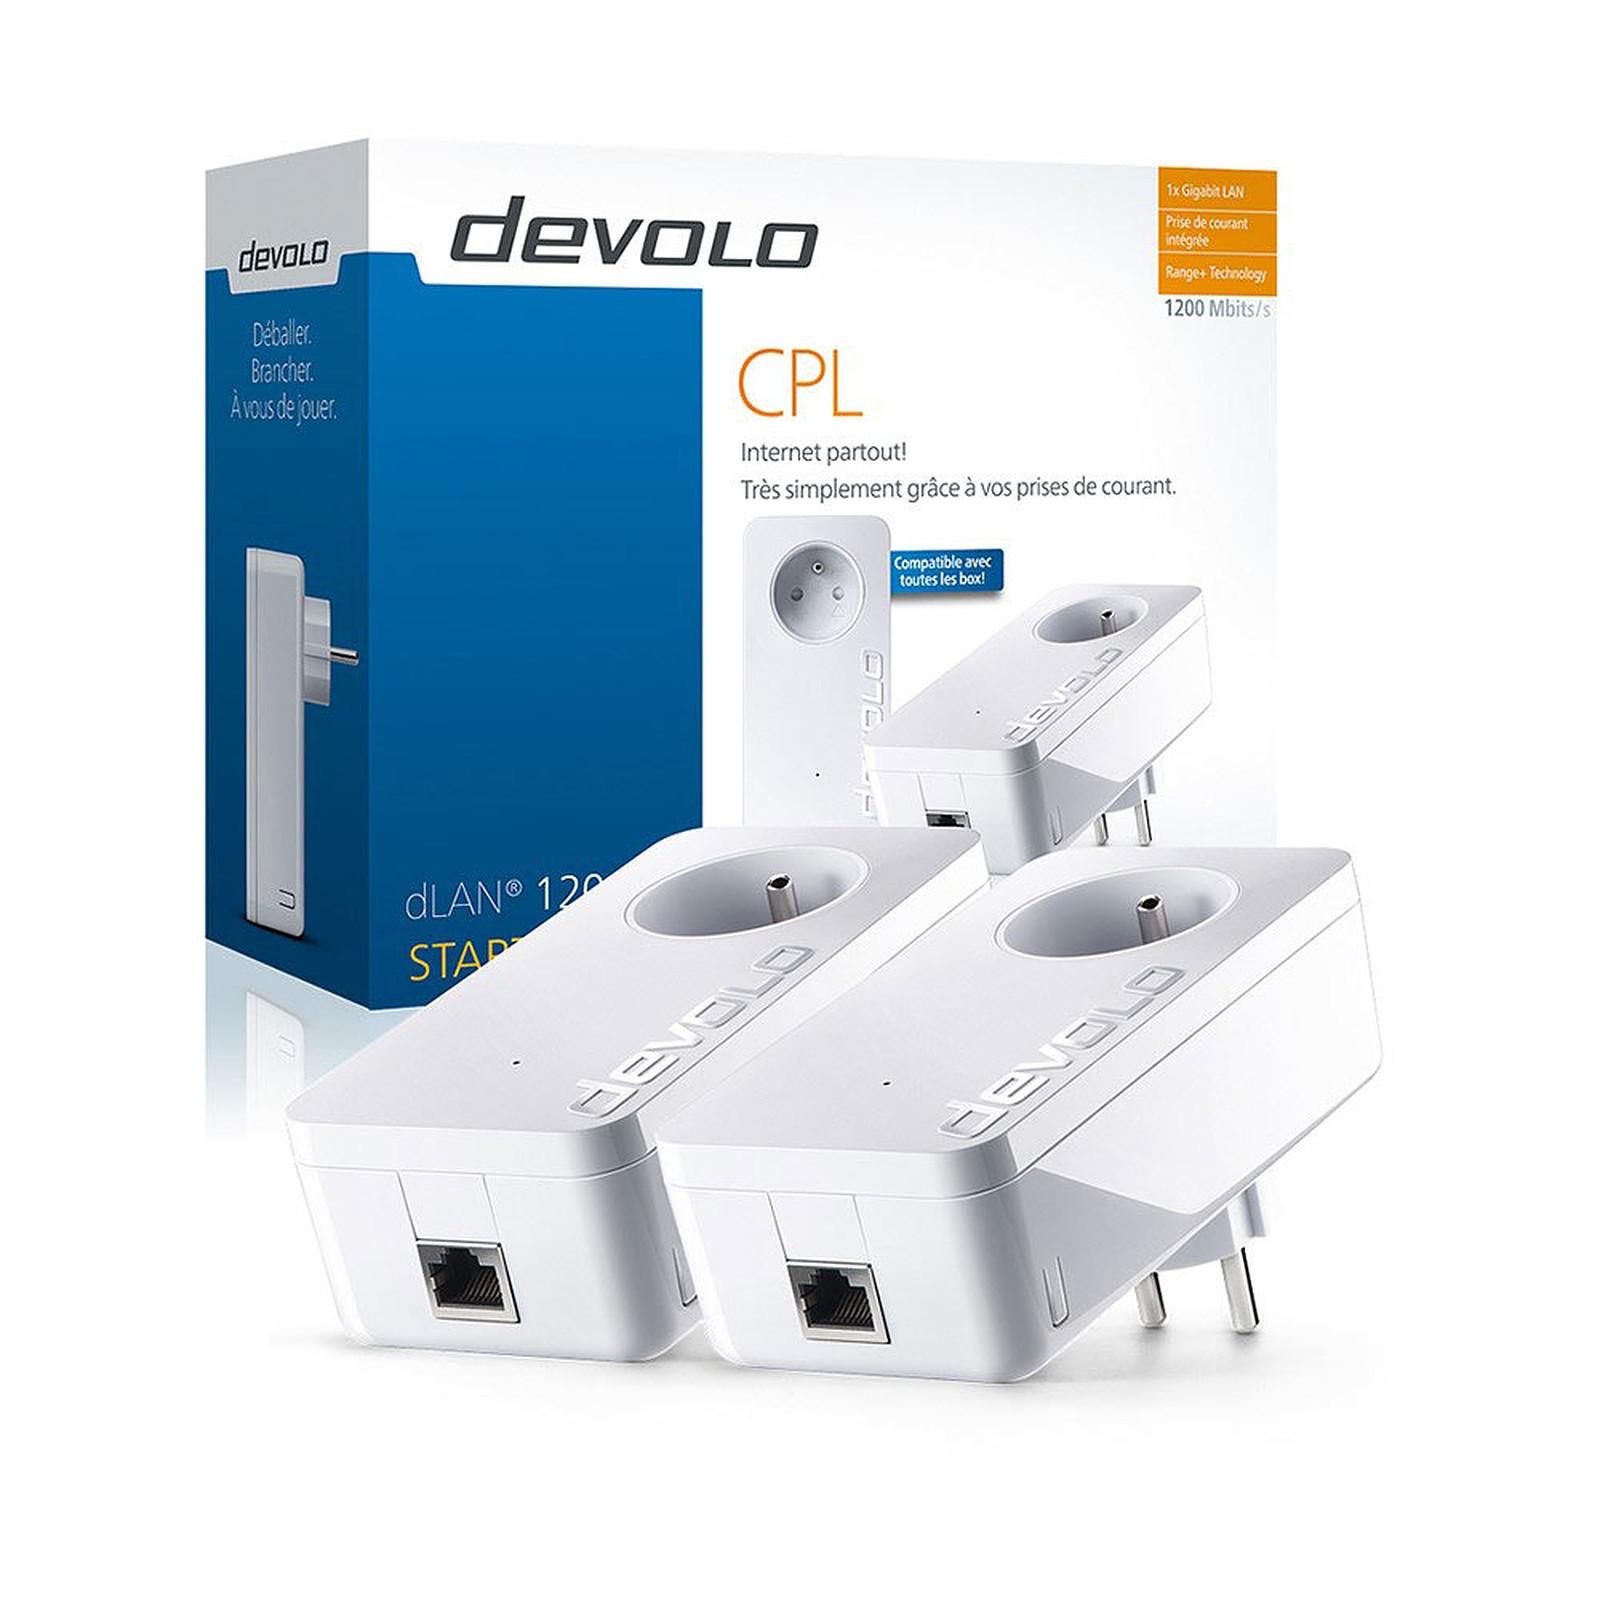 Devolo dLAN 1200+ Starter Kit - CPL Devolo AG sur LDLC.com